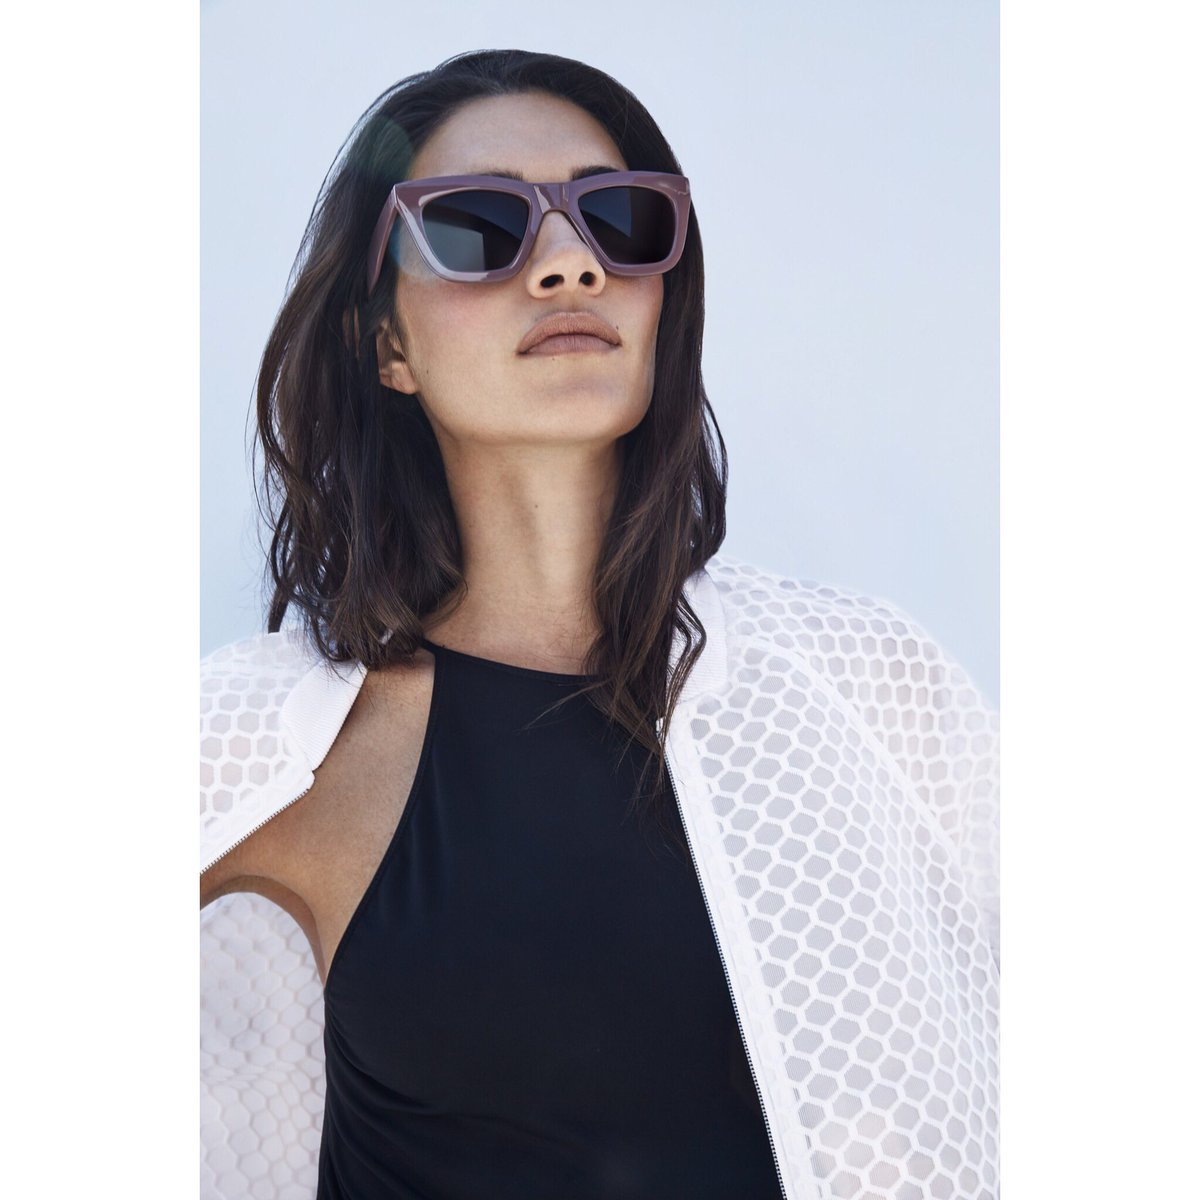 349c9aa6c8d  sportswear  cool  chic  teresamoore  sunglasses  coolframes   modelpic.twitter.com 2QobyKGwK5